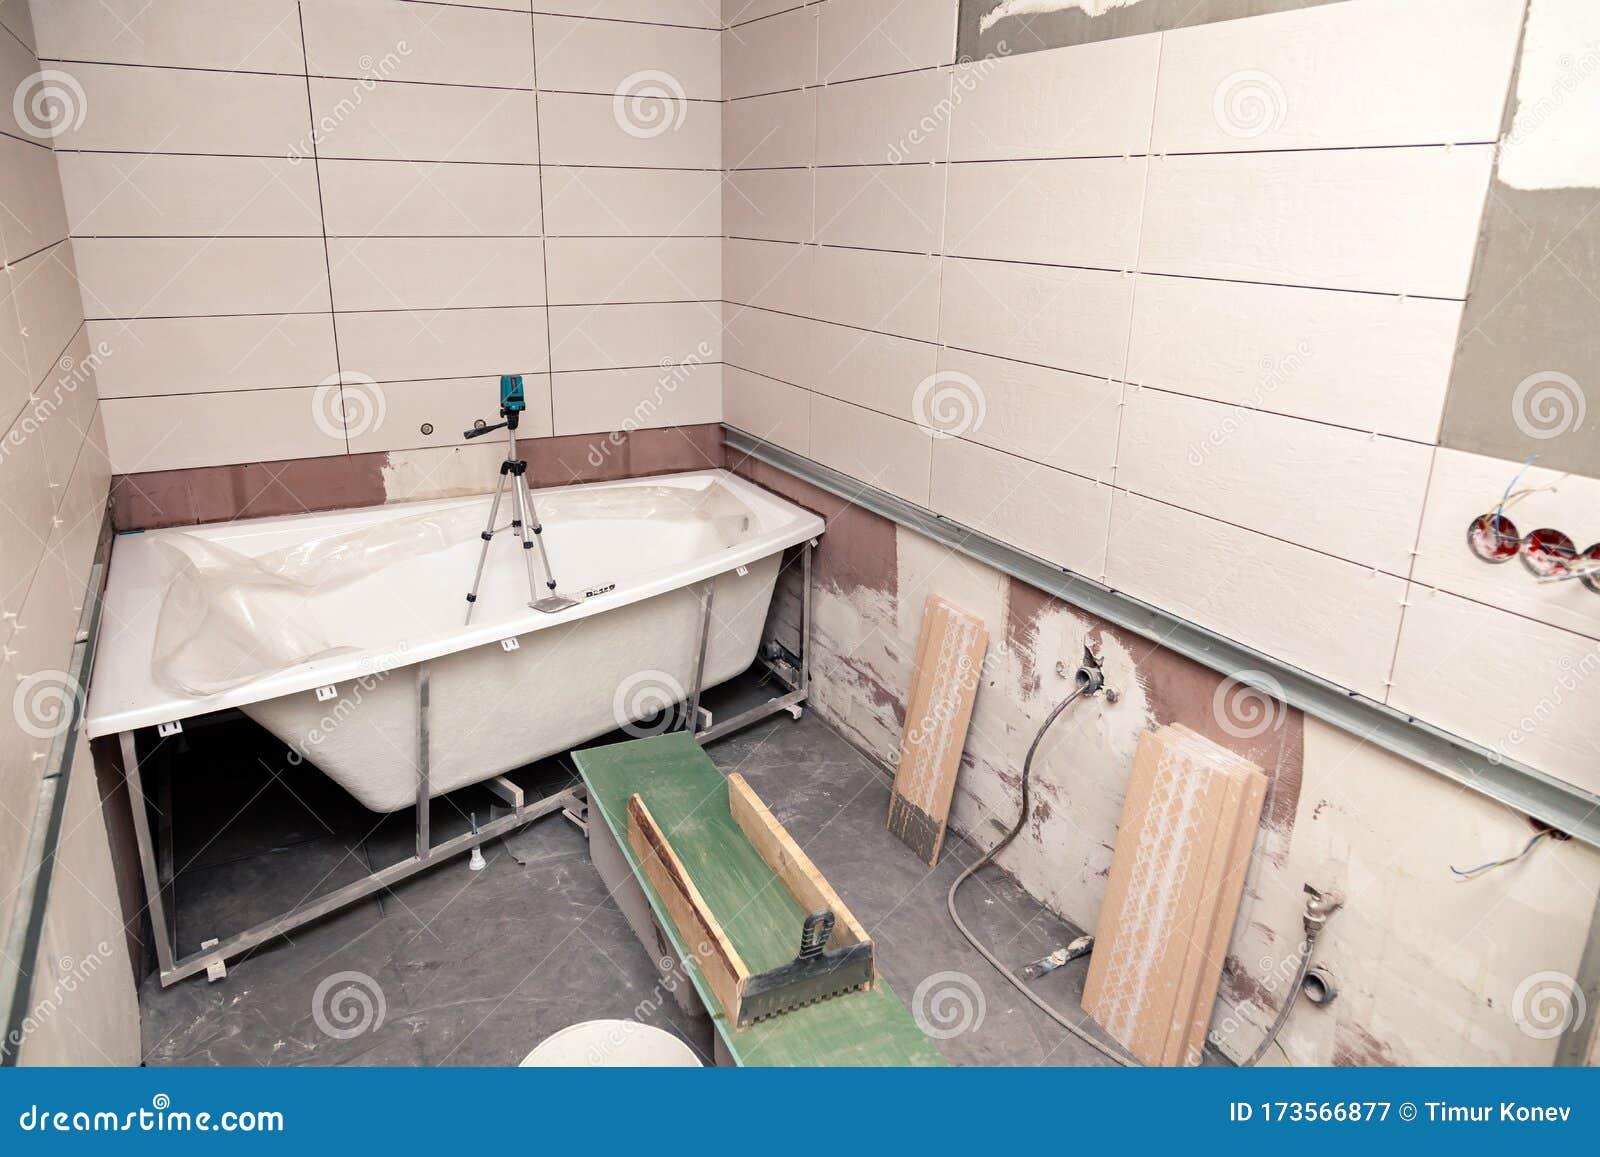 Bathroom Interior Repair Laying Tiles On Walls Stock Image Image Of Renovation Bath 173566877